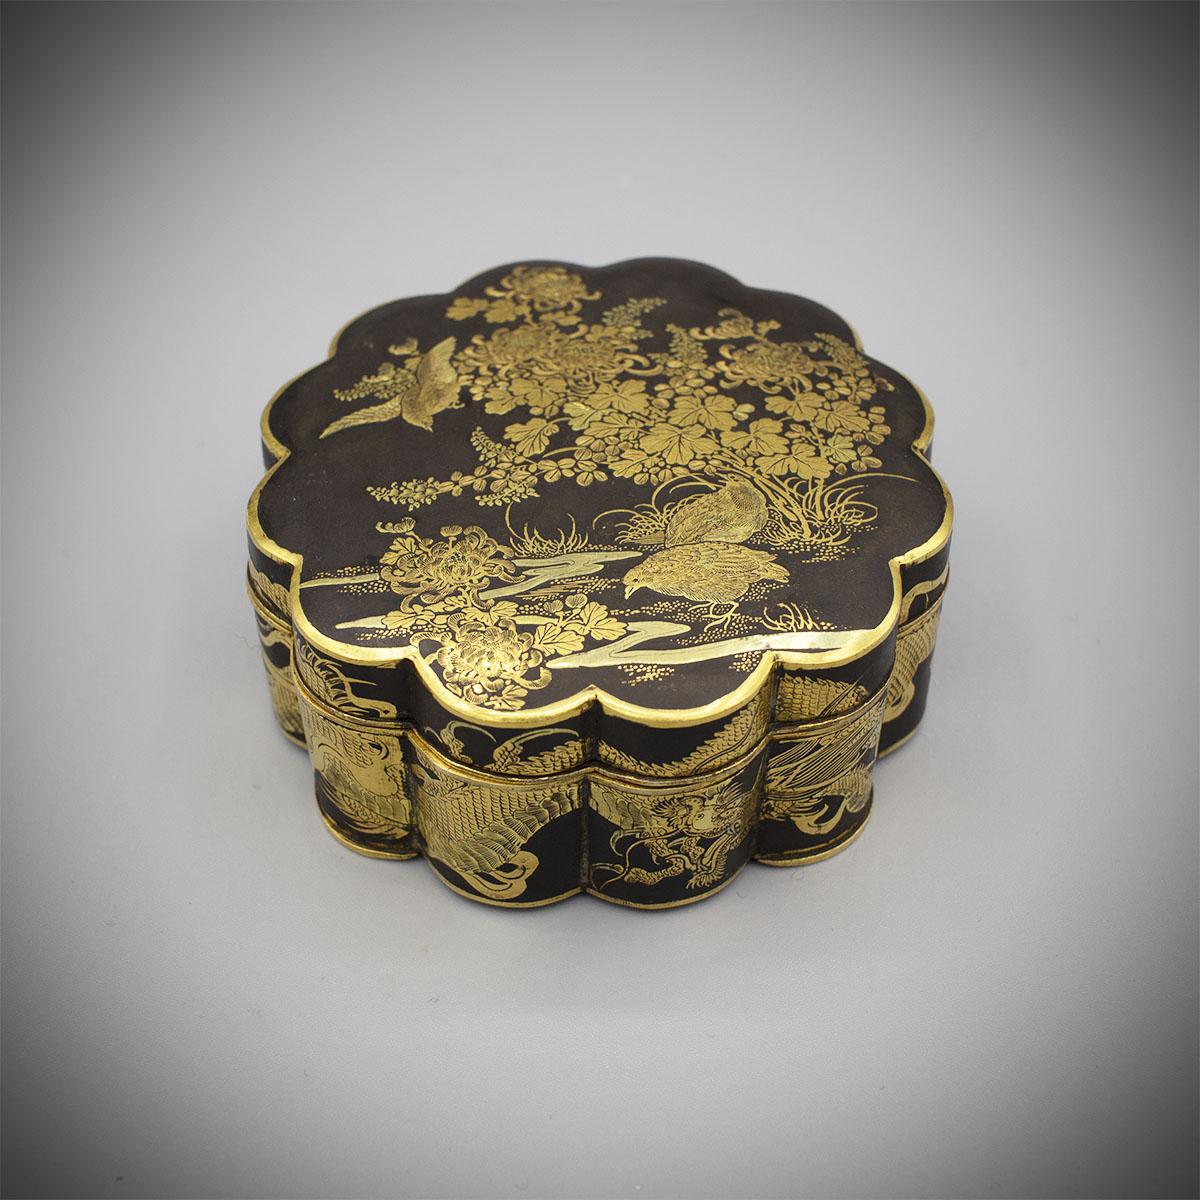 Komai Style Kyoto Inlaid Iron Box by Fujii Yoshitoyo MR3471_v.1